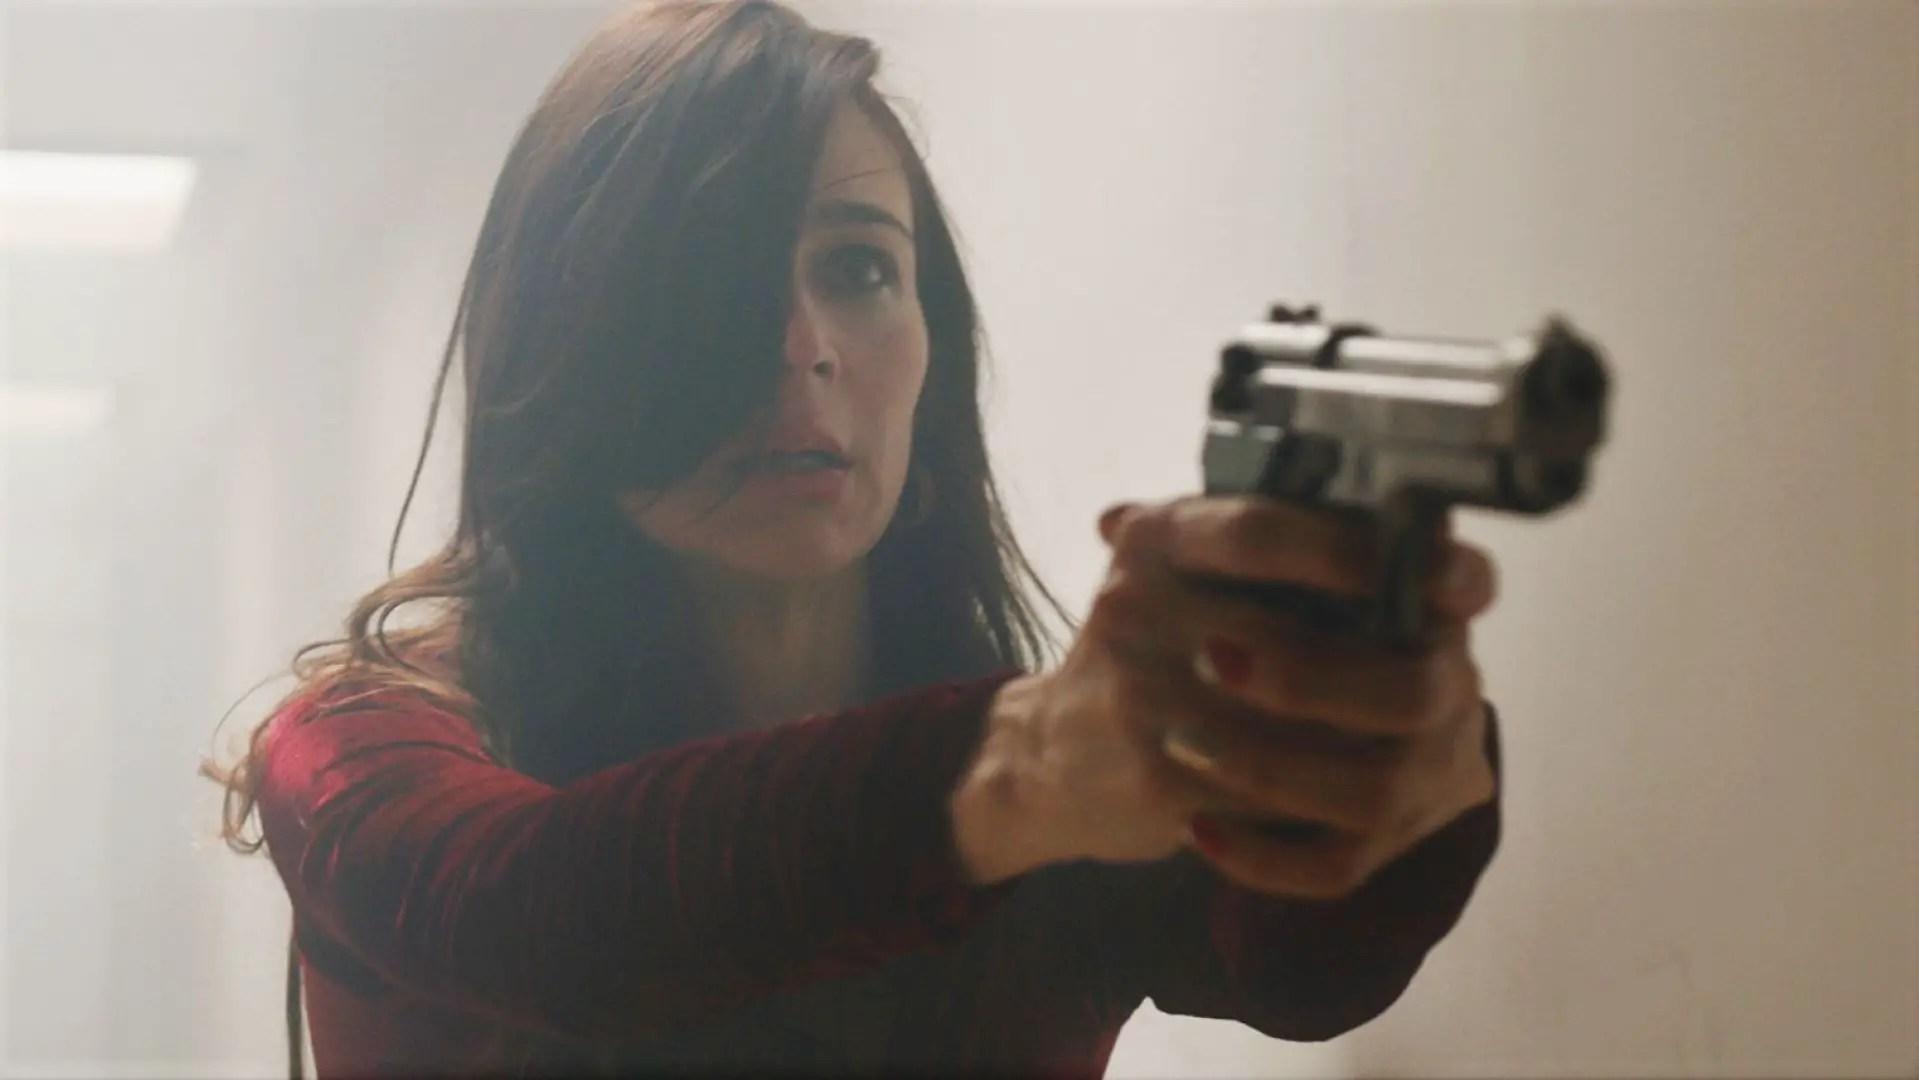 La Mala Noche' Review: Stylish directing sheds light on enslavement